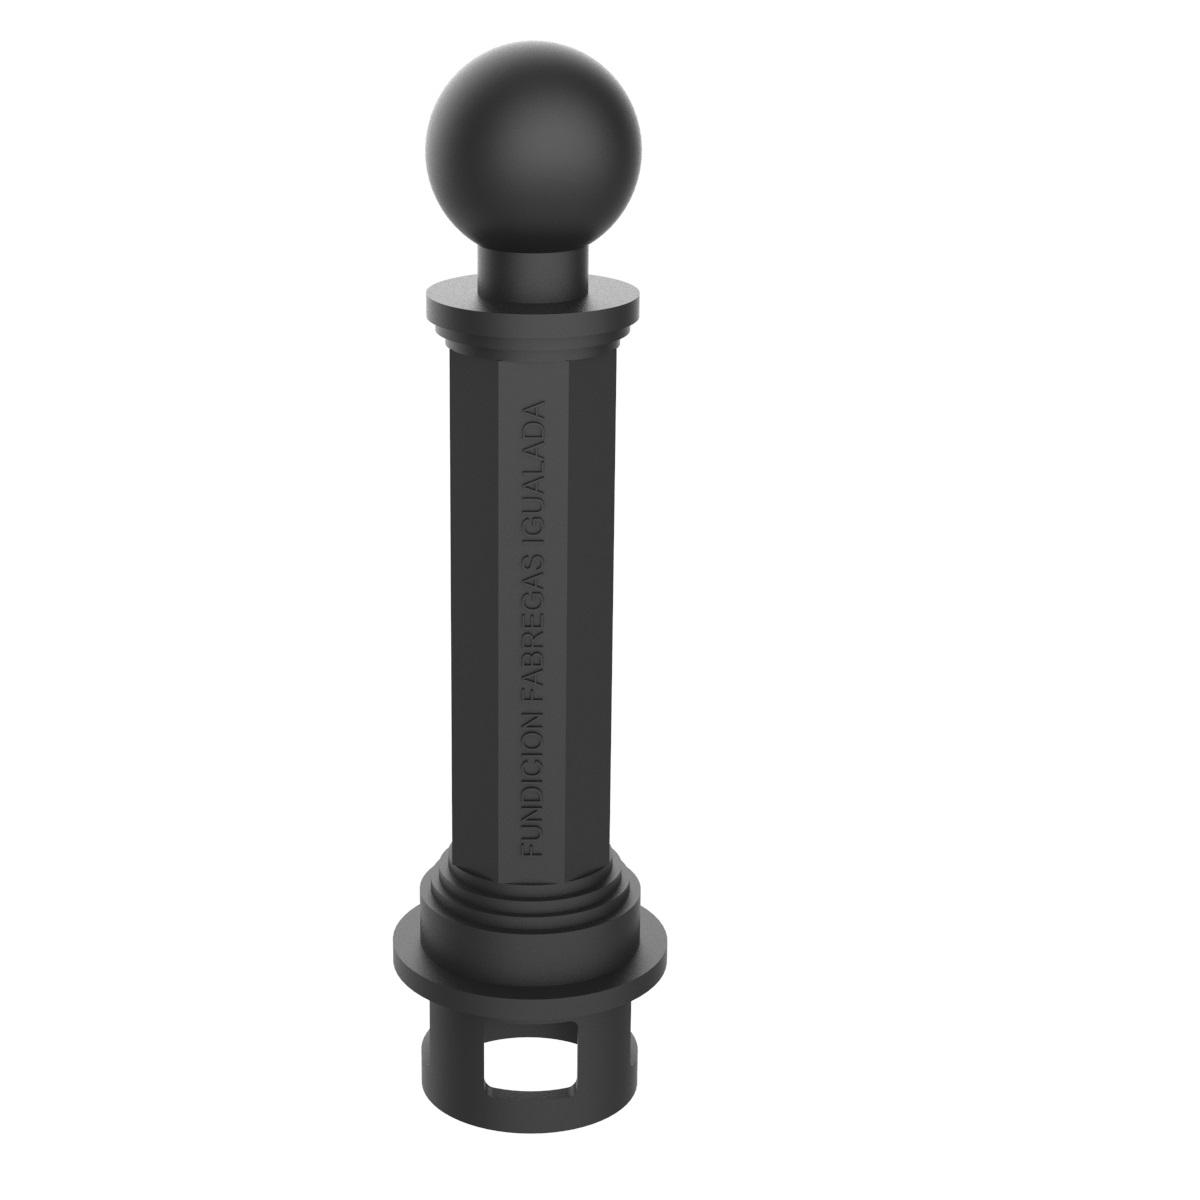 Pilona Valencia Pequeña de 580mm de altura - C-45AP